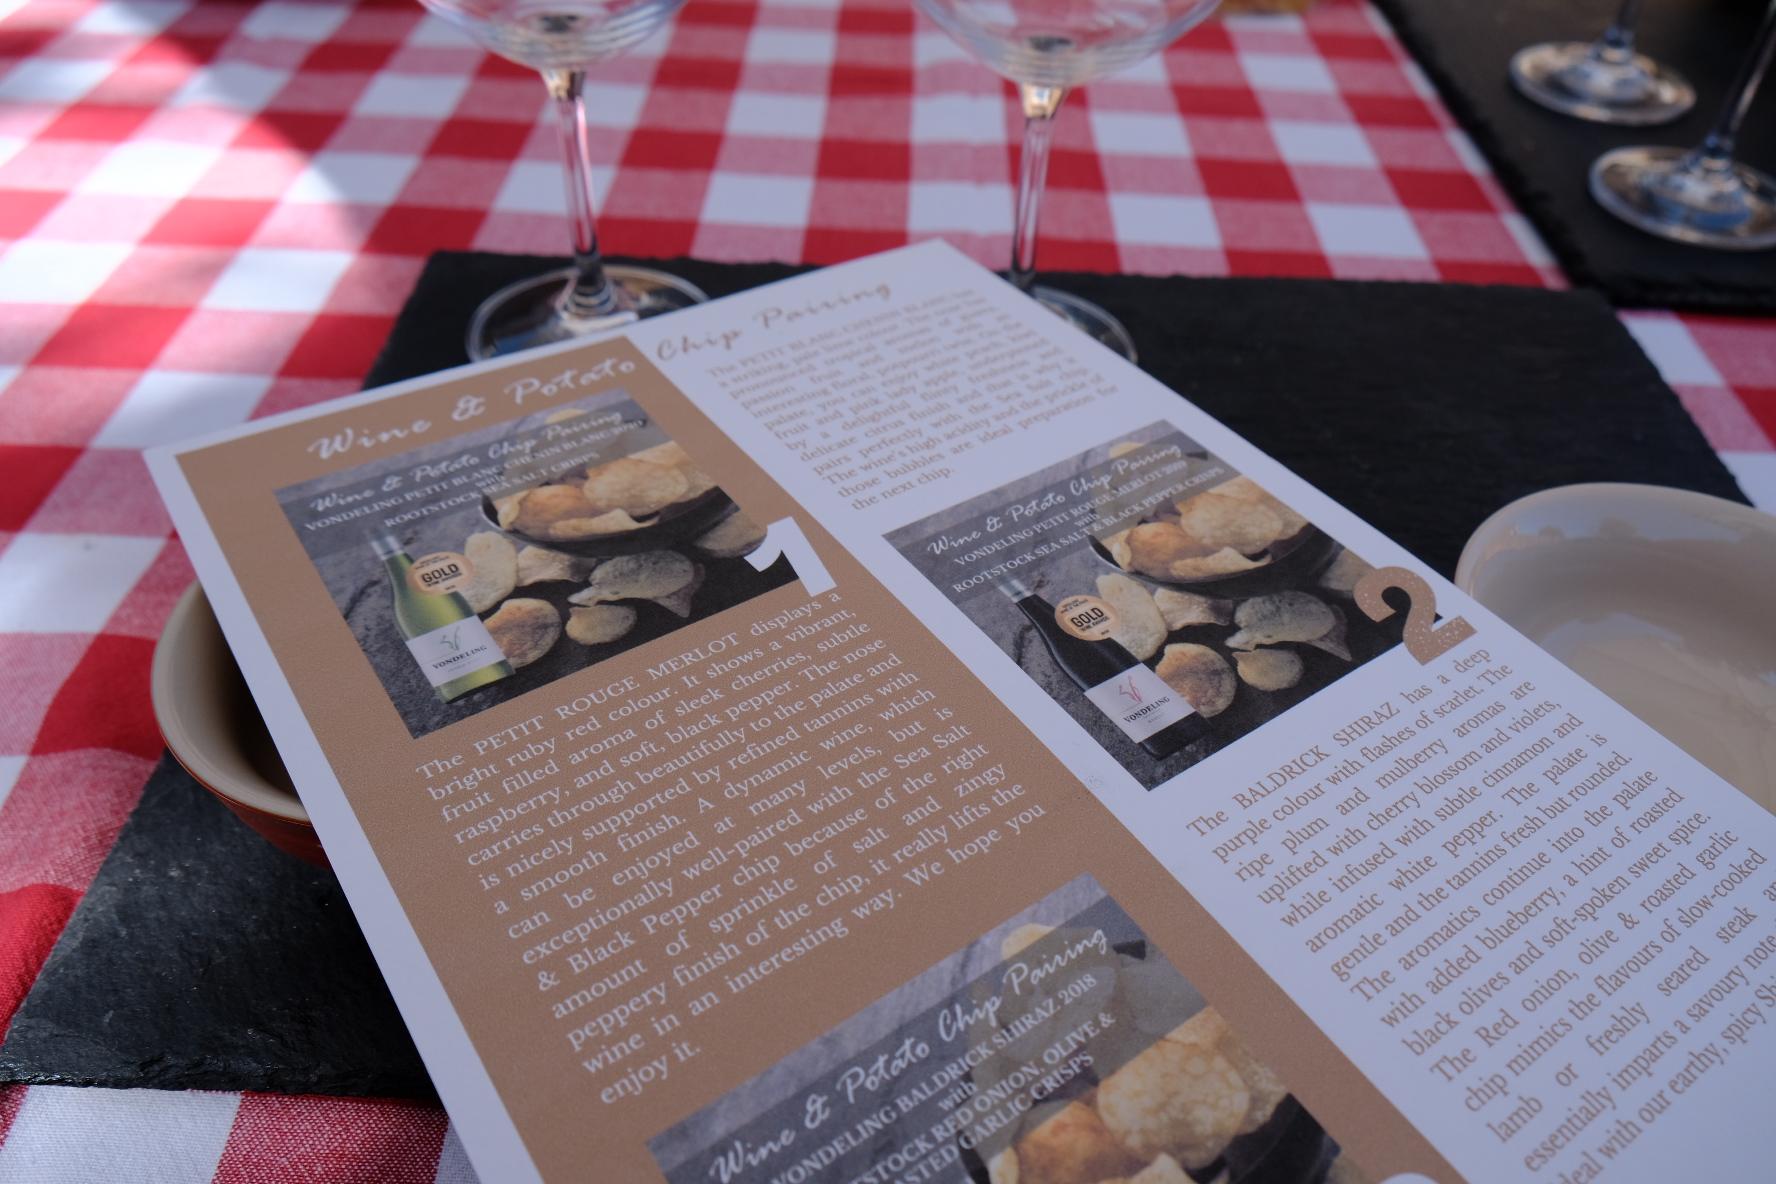 Vondeling Wine and Chip Pairing Boozy Foodie